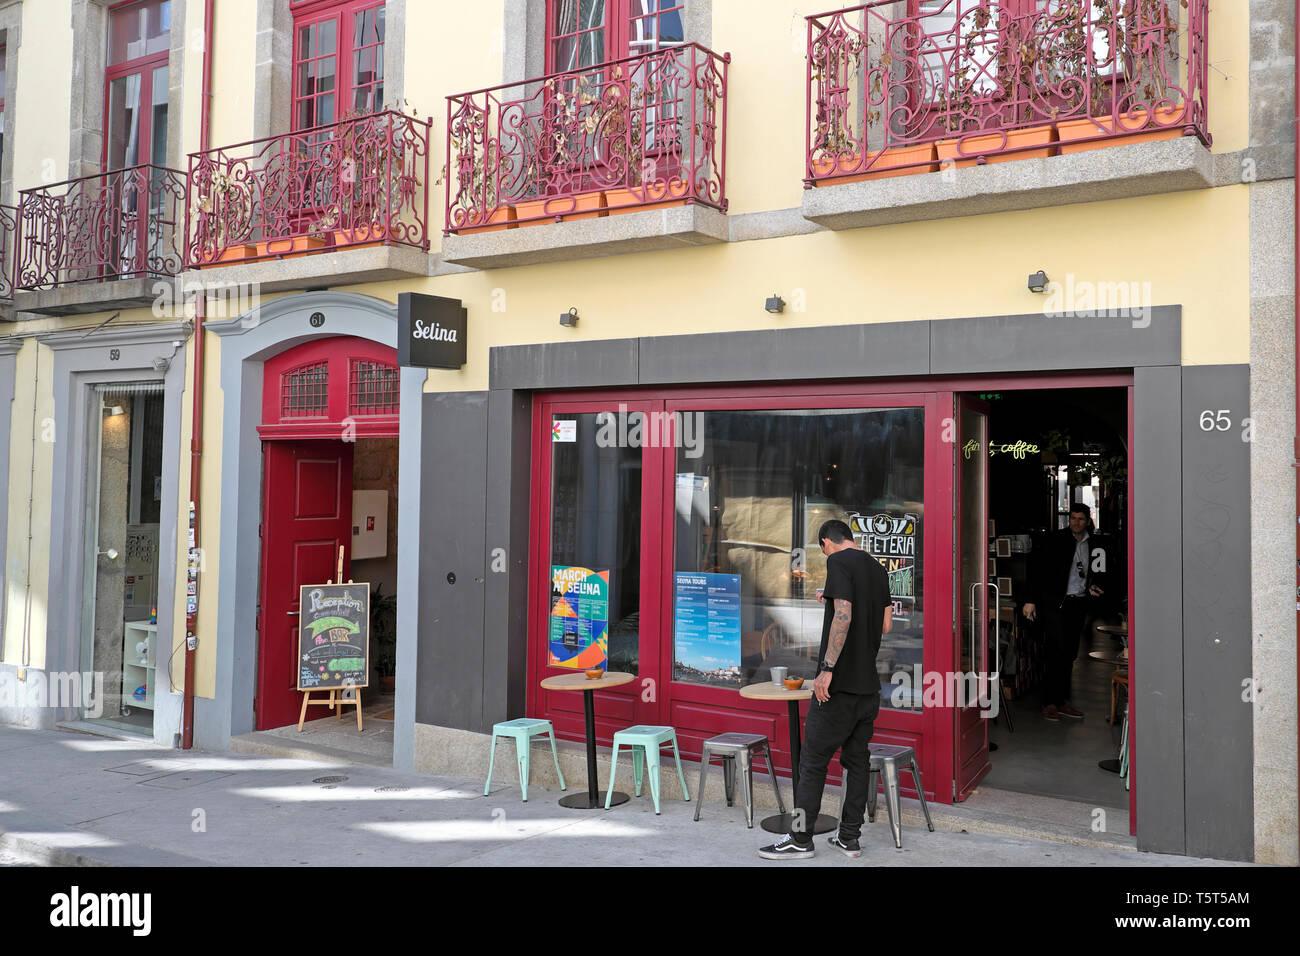 Selina Youth Hostel in the Portuguese city of Porto Oporto Portugal Europe EU  KATHY DEWITT - Stock Image